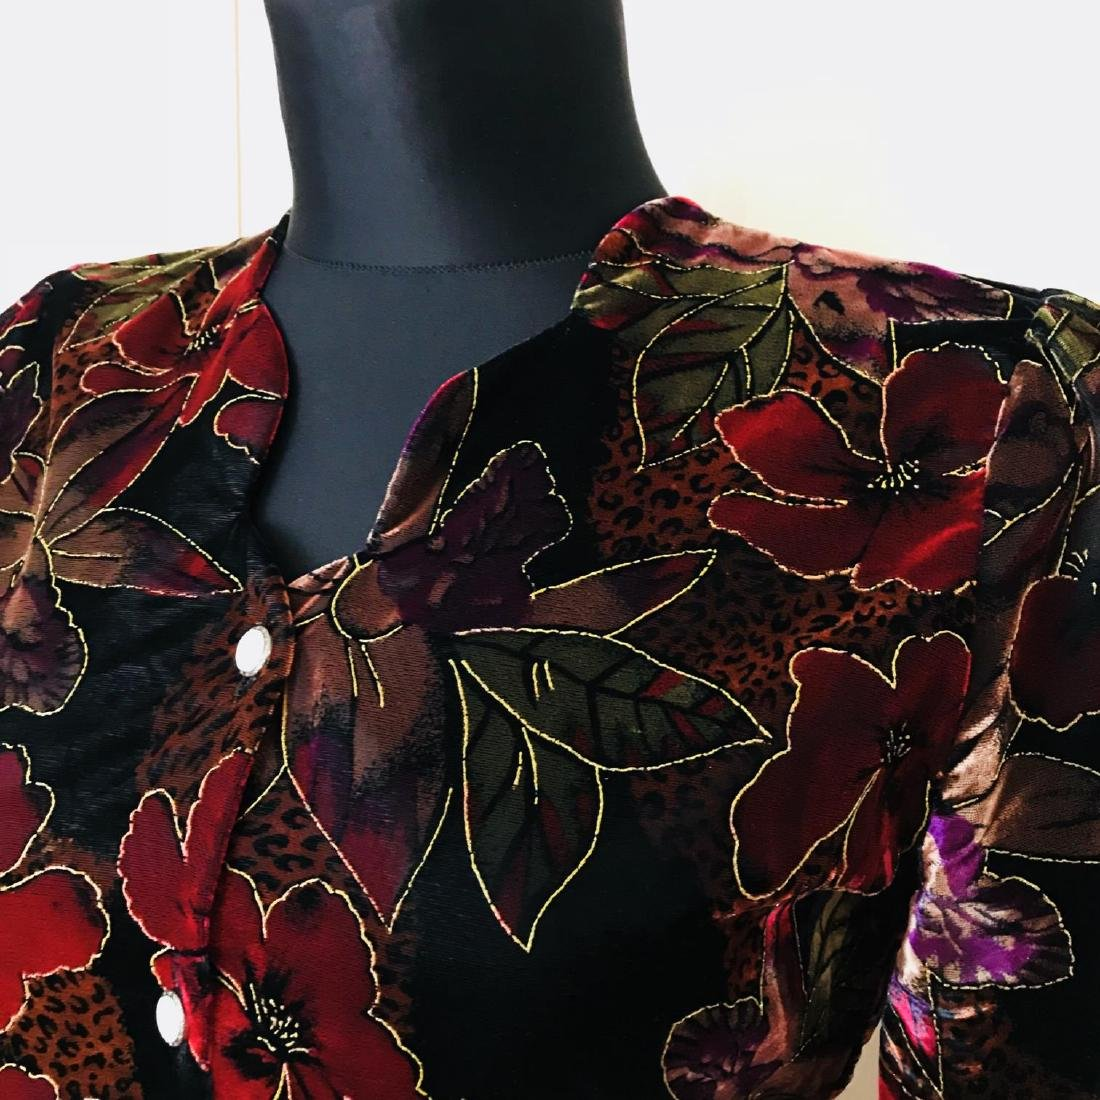 Vintage Women's Jacket Blazer Top Size US 10 EUR 40 - 4